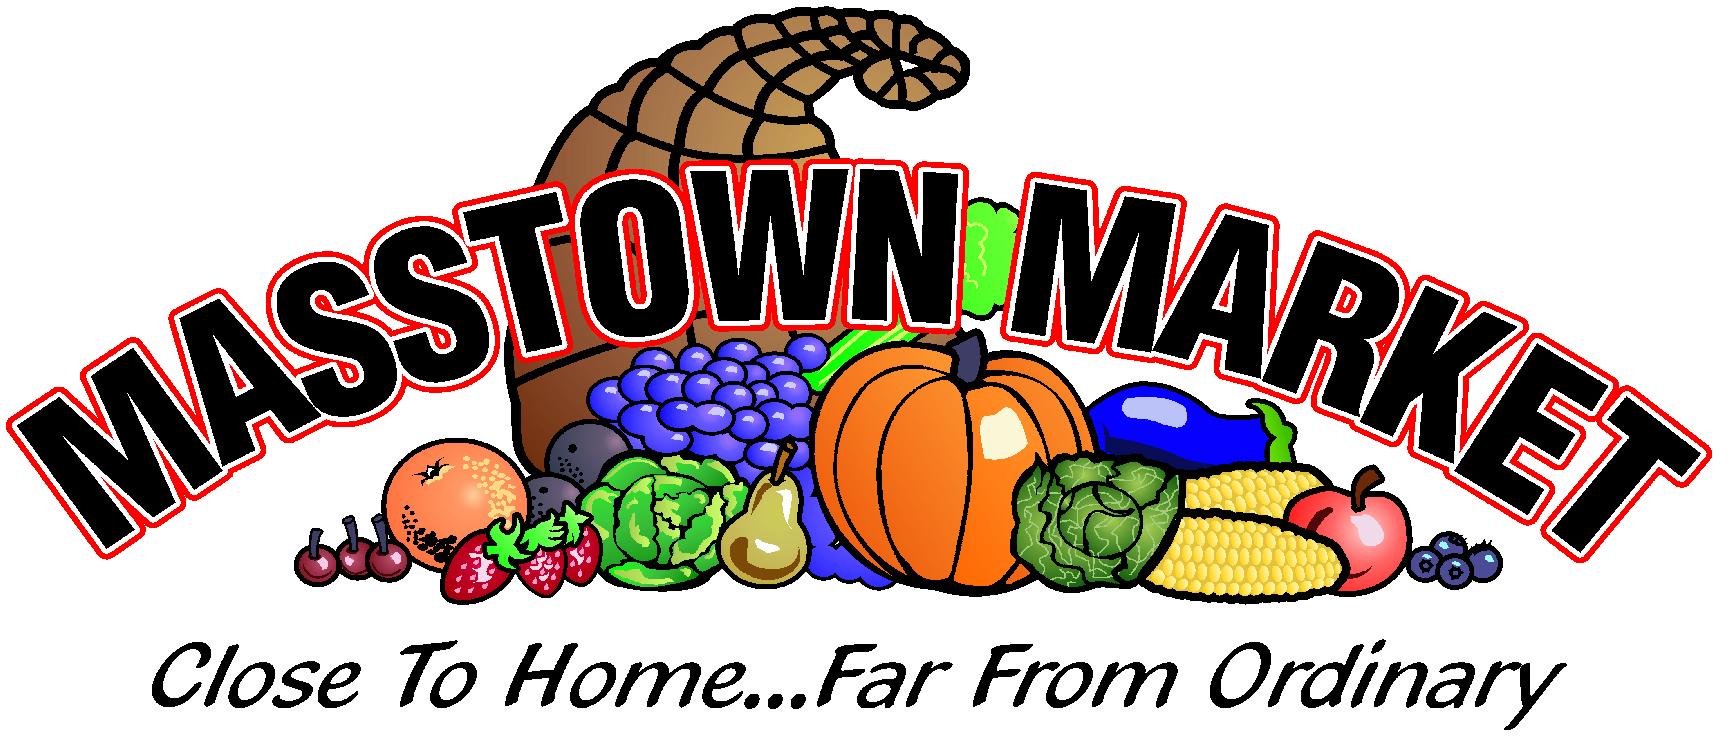 masstown market logo.jpg